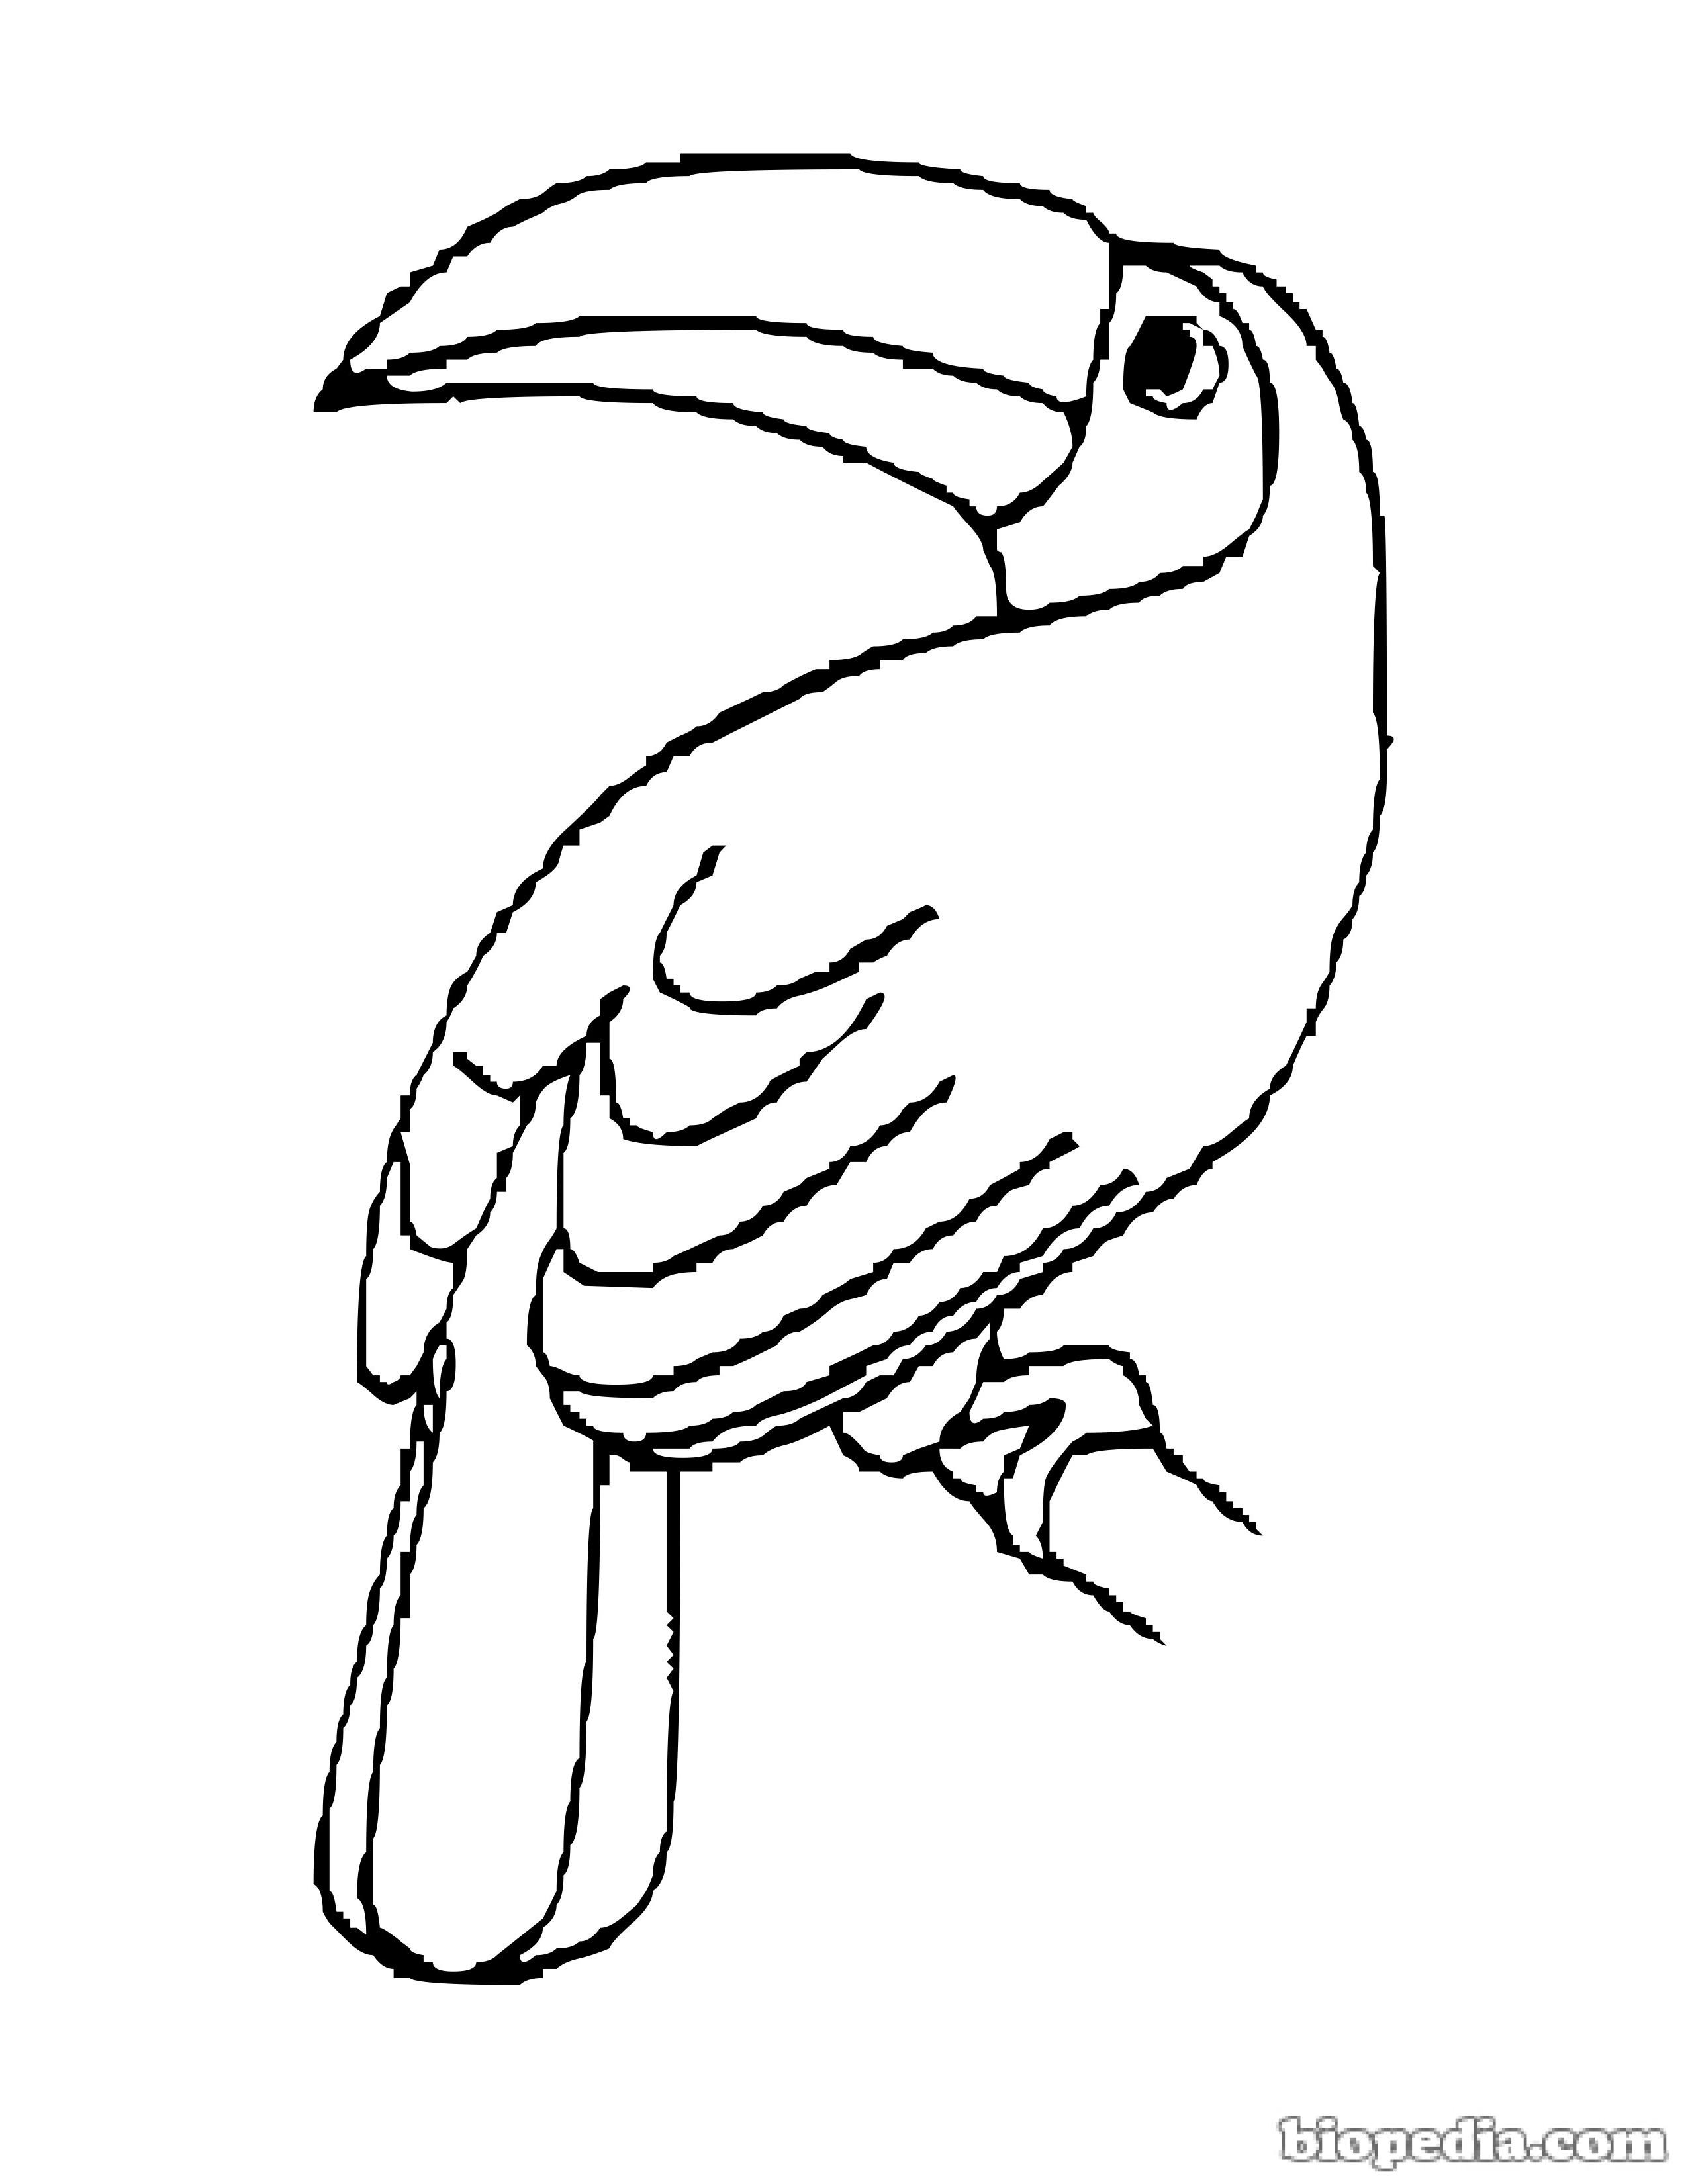 Aves para colorear | BIOPEDIA